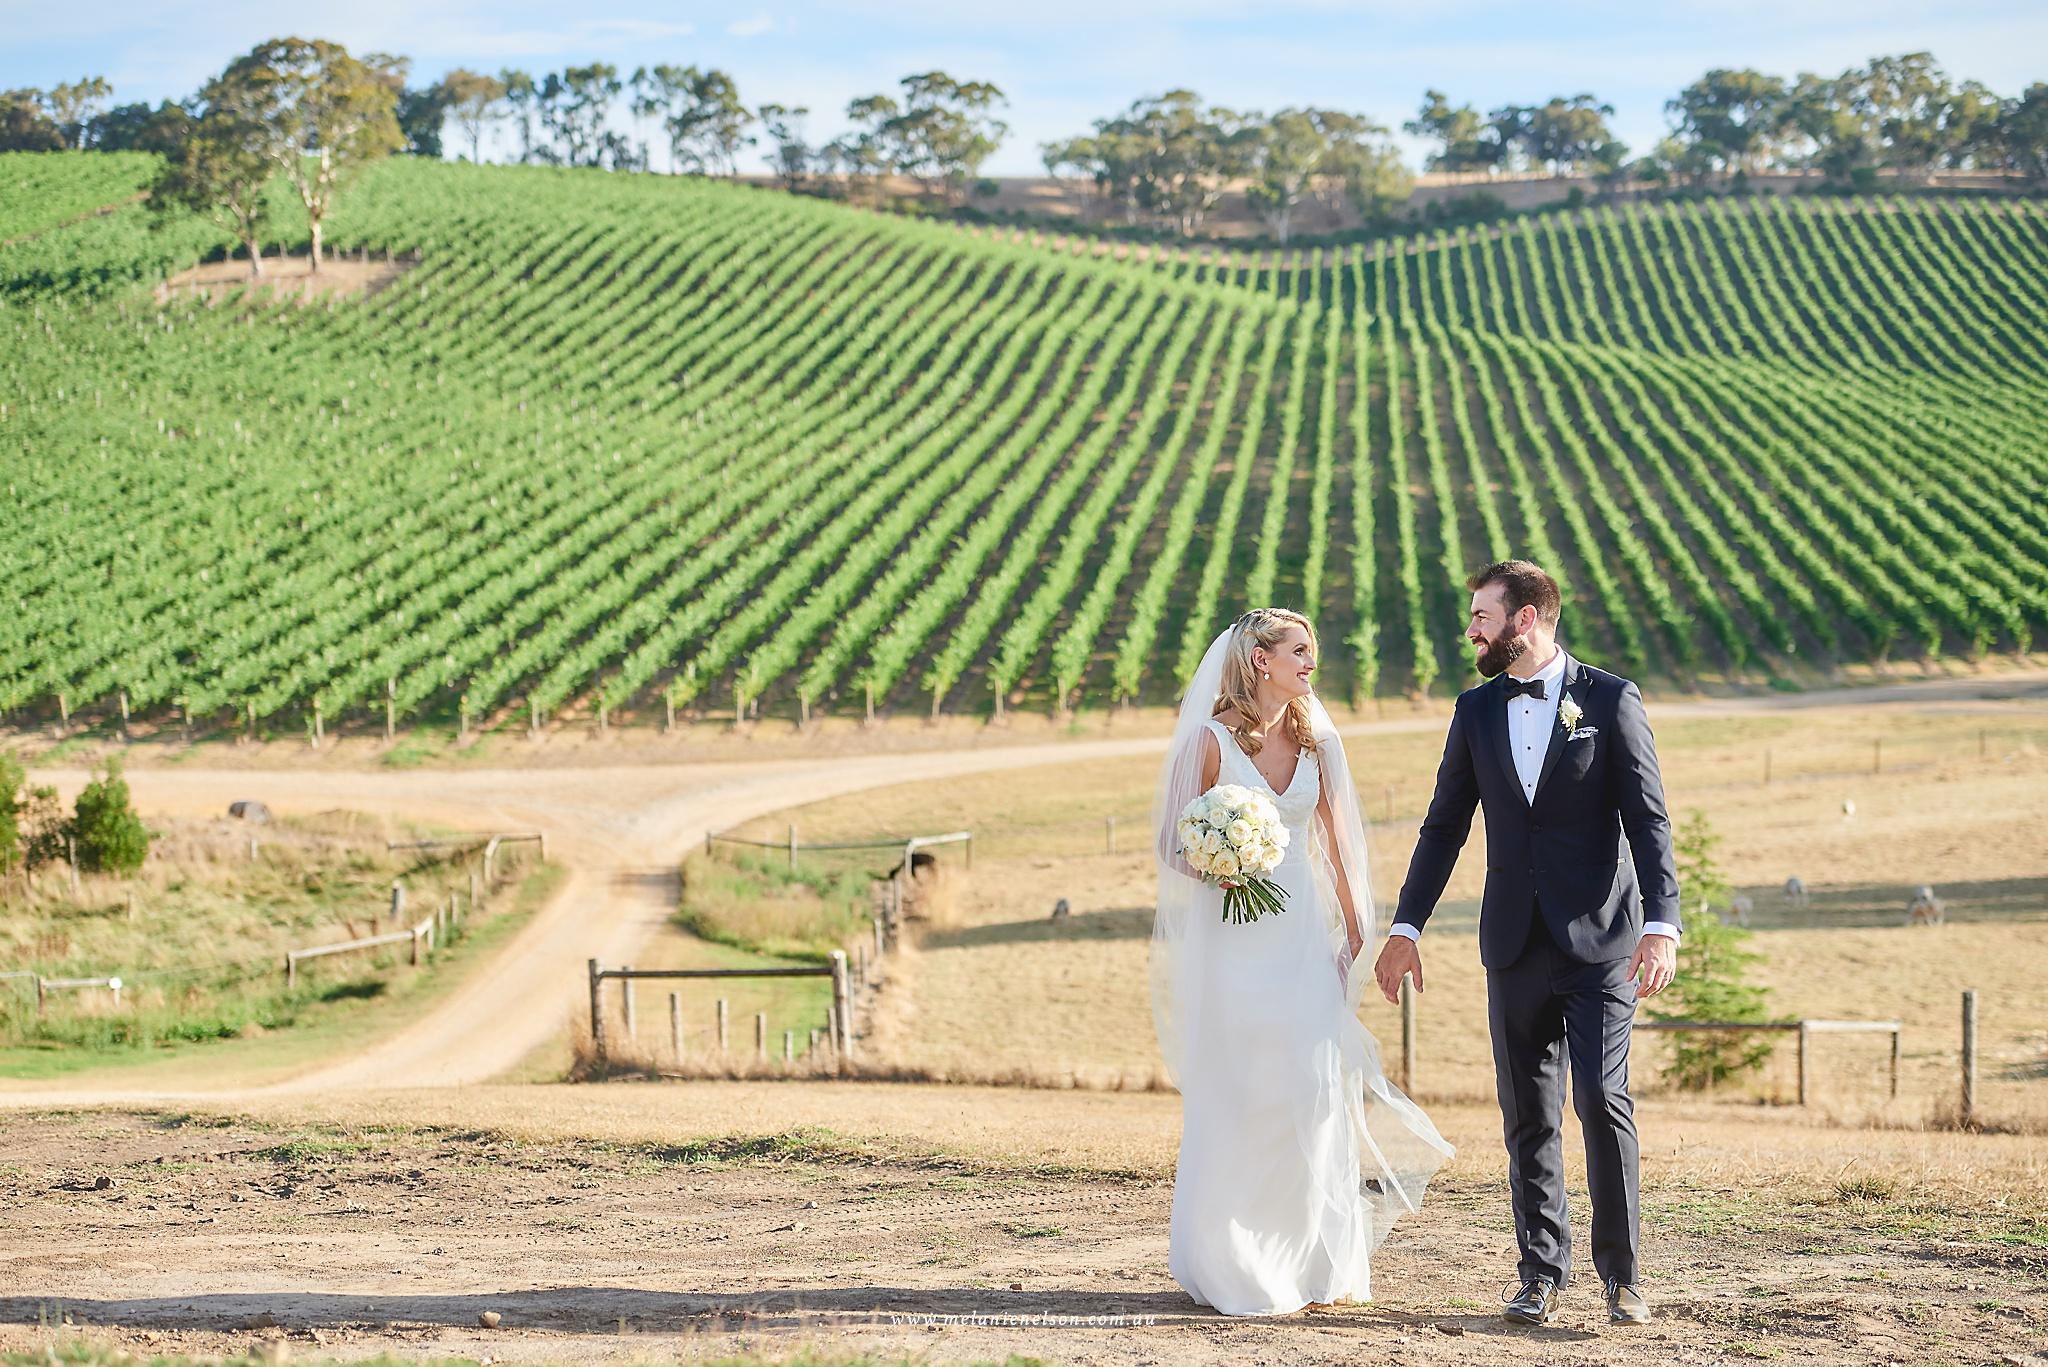 longview_vineyard_wedding_0056.jpg